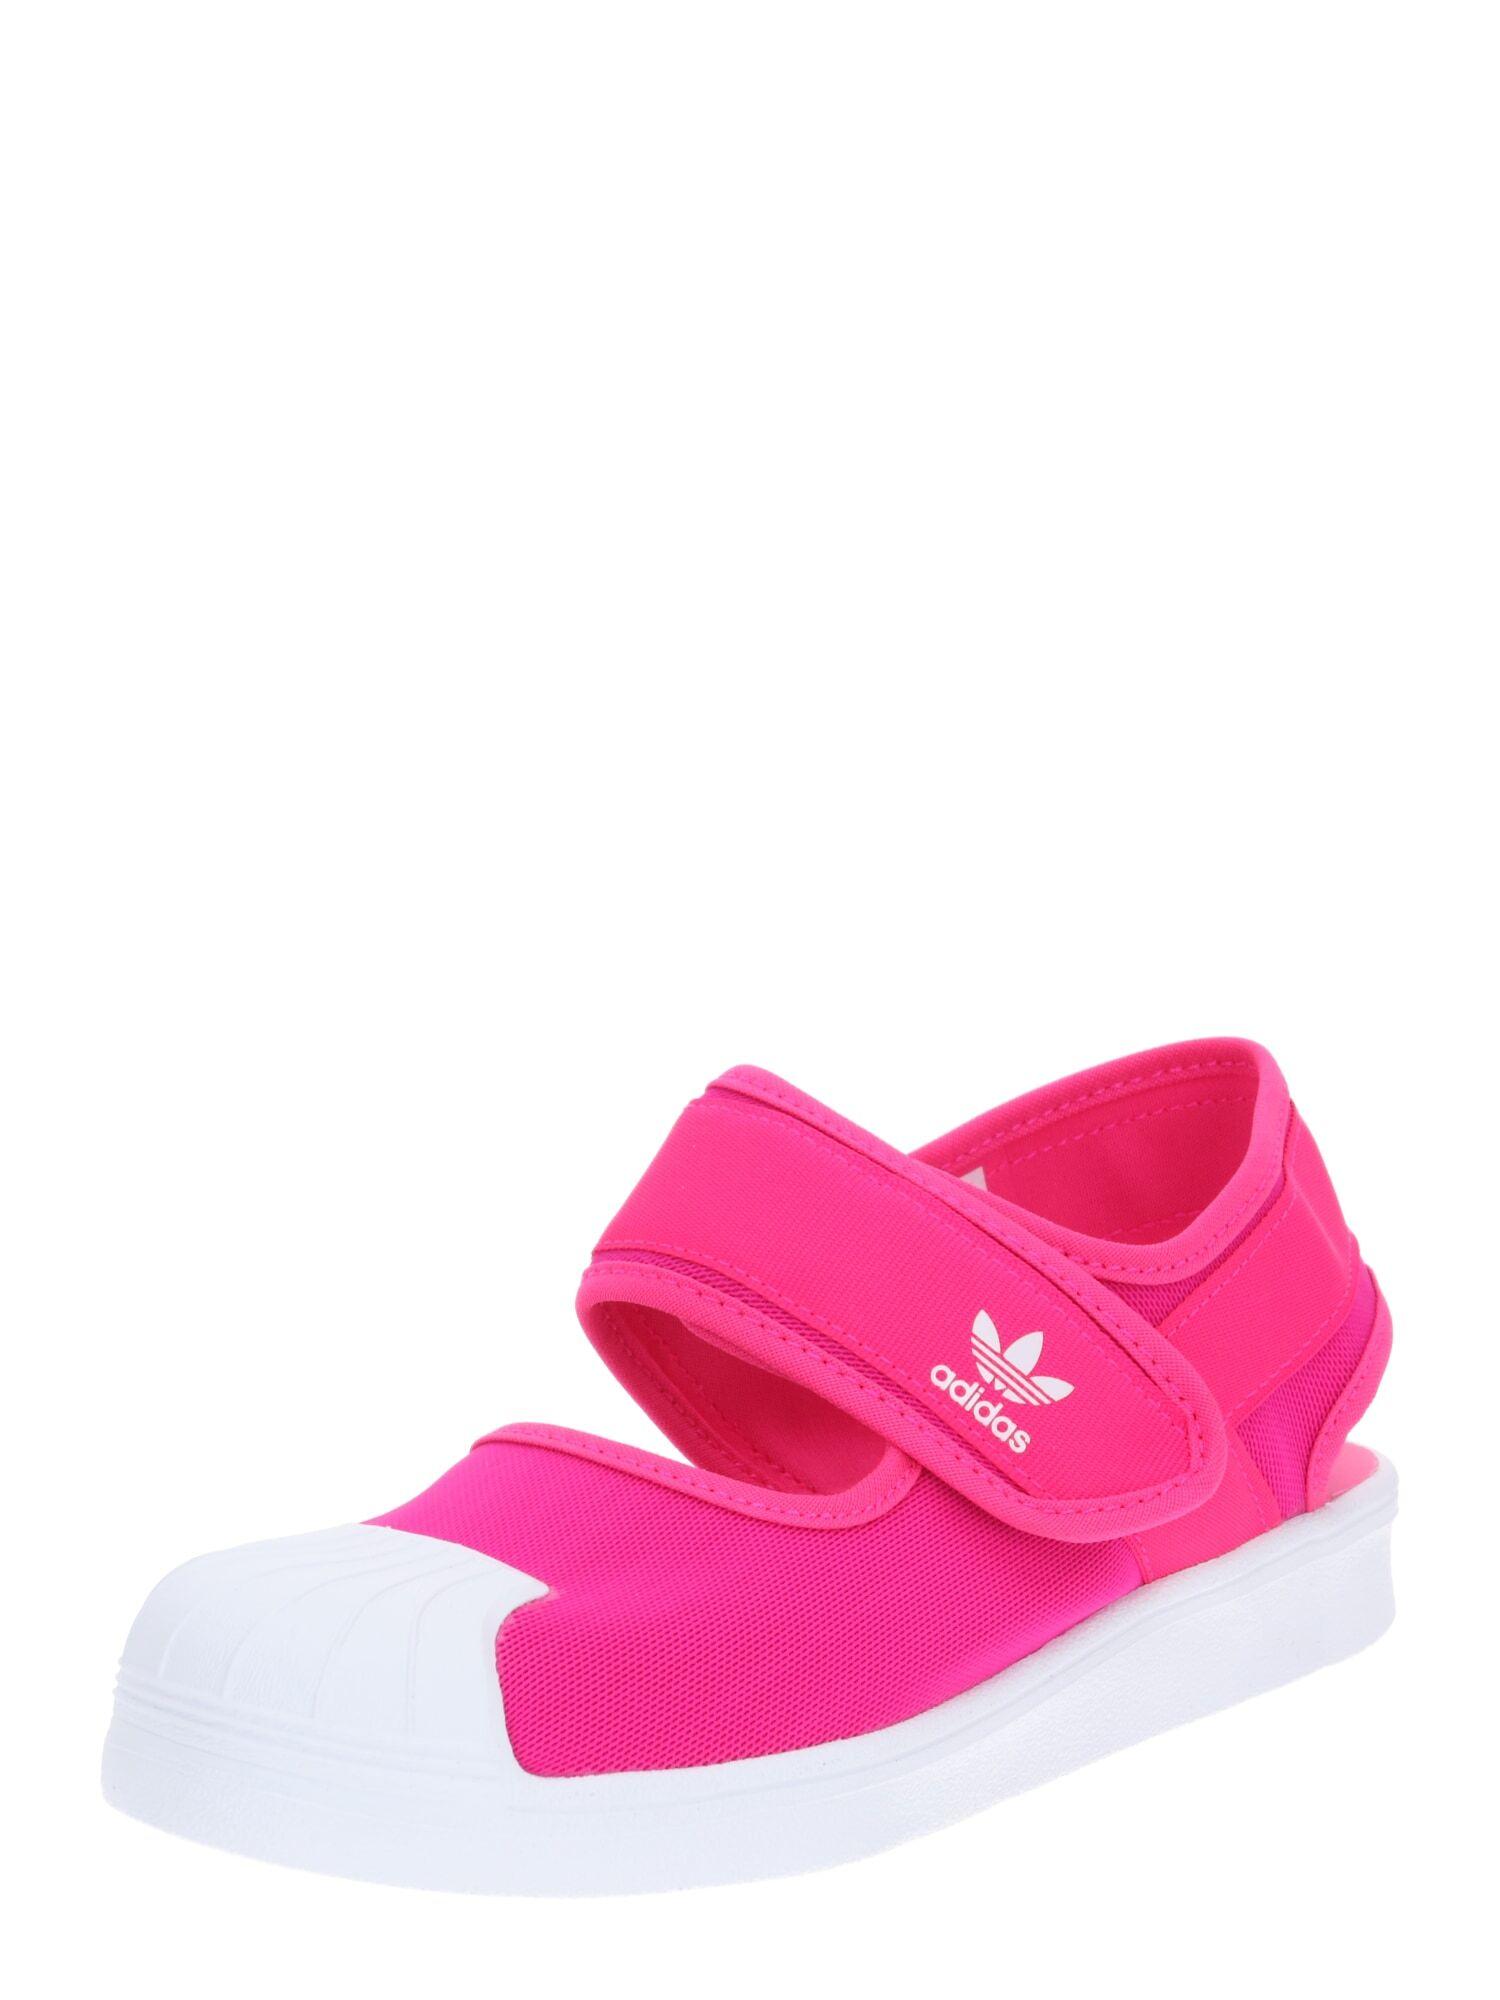 ADIDAS ORIGINALS Chaussures ouvertes 'SANDA'  - Rose - Taille: 30.5 - boy